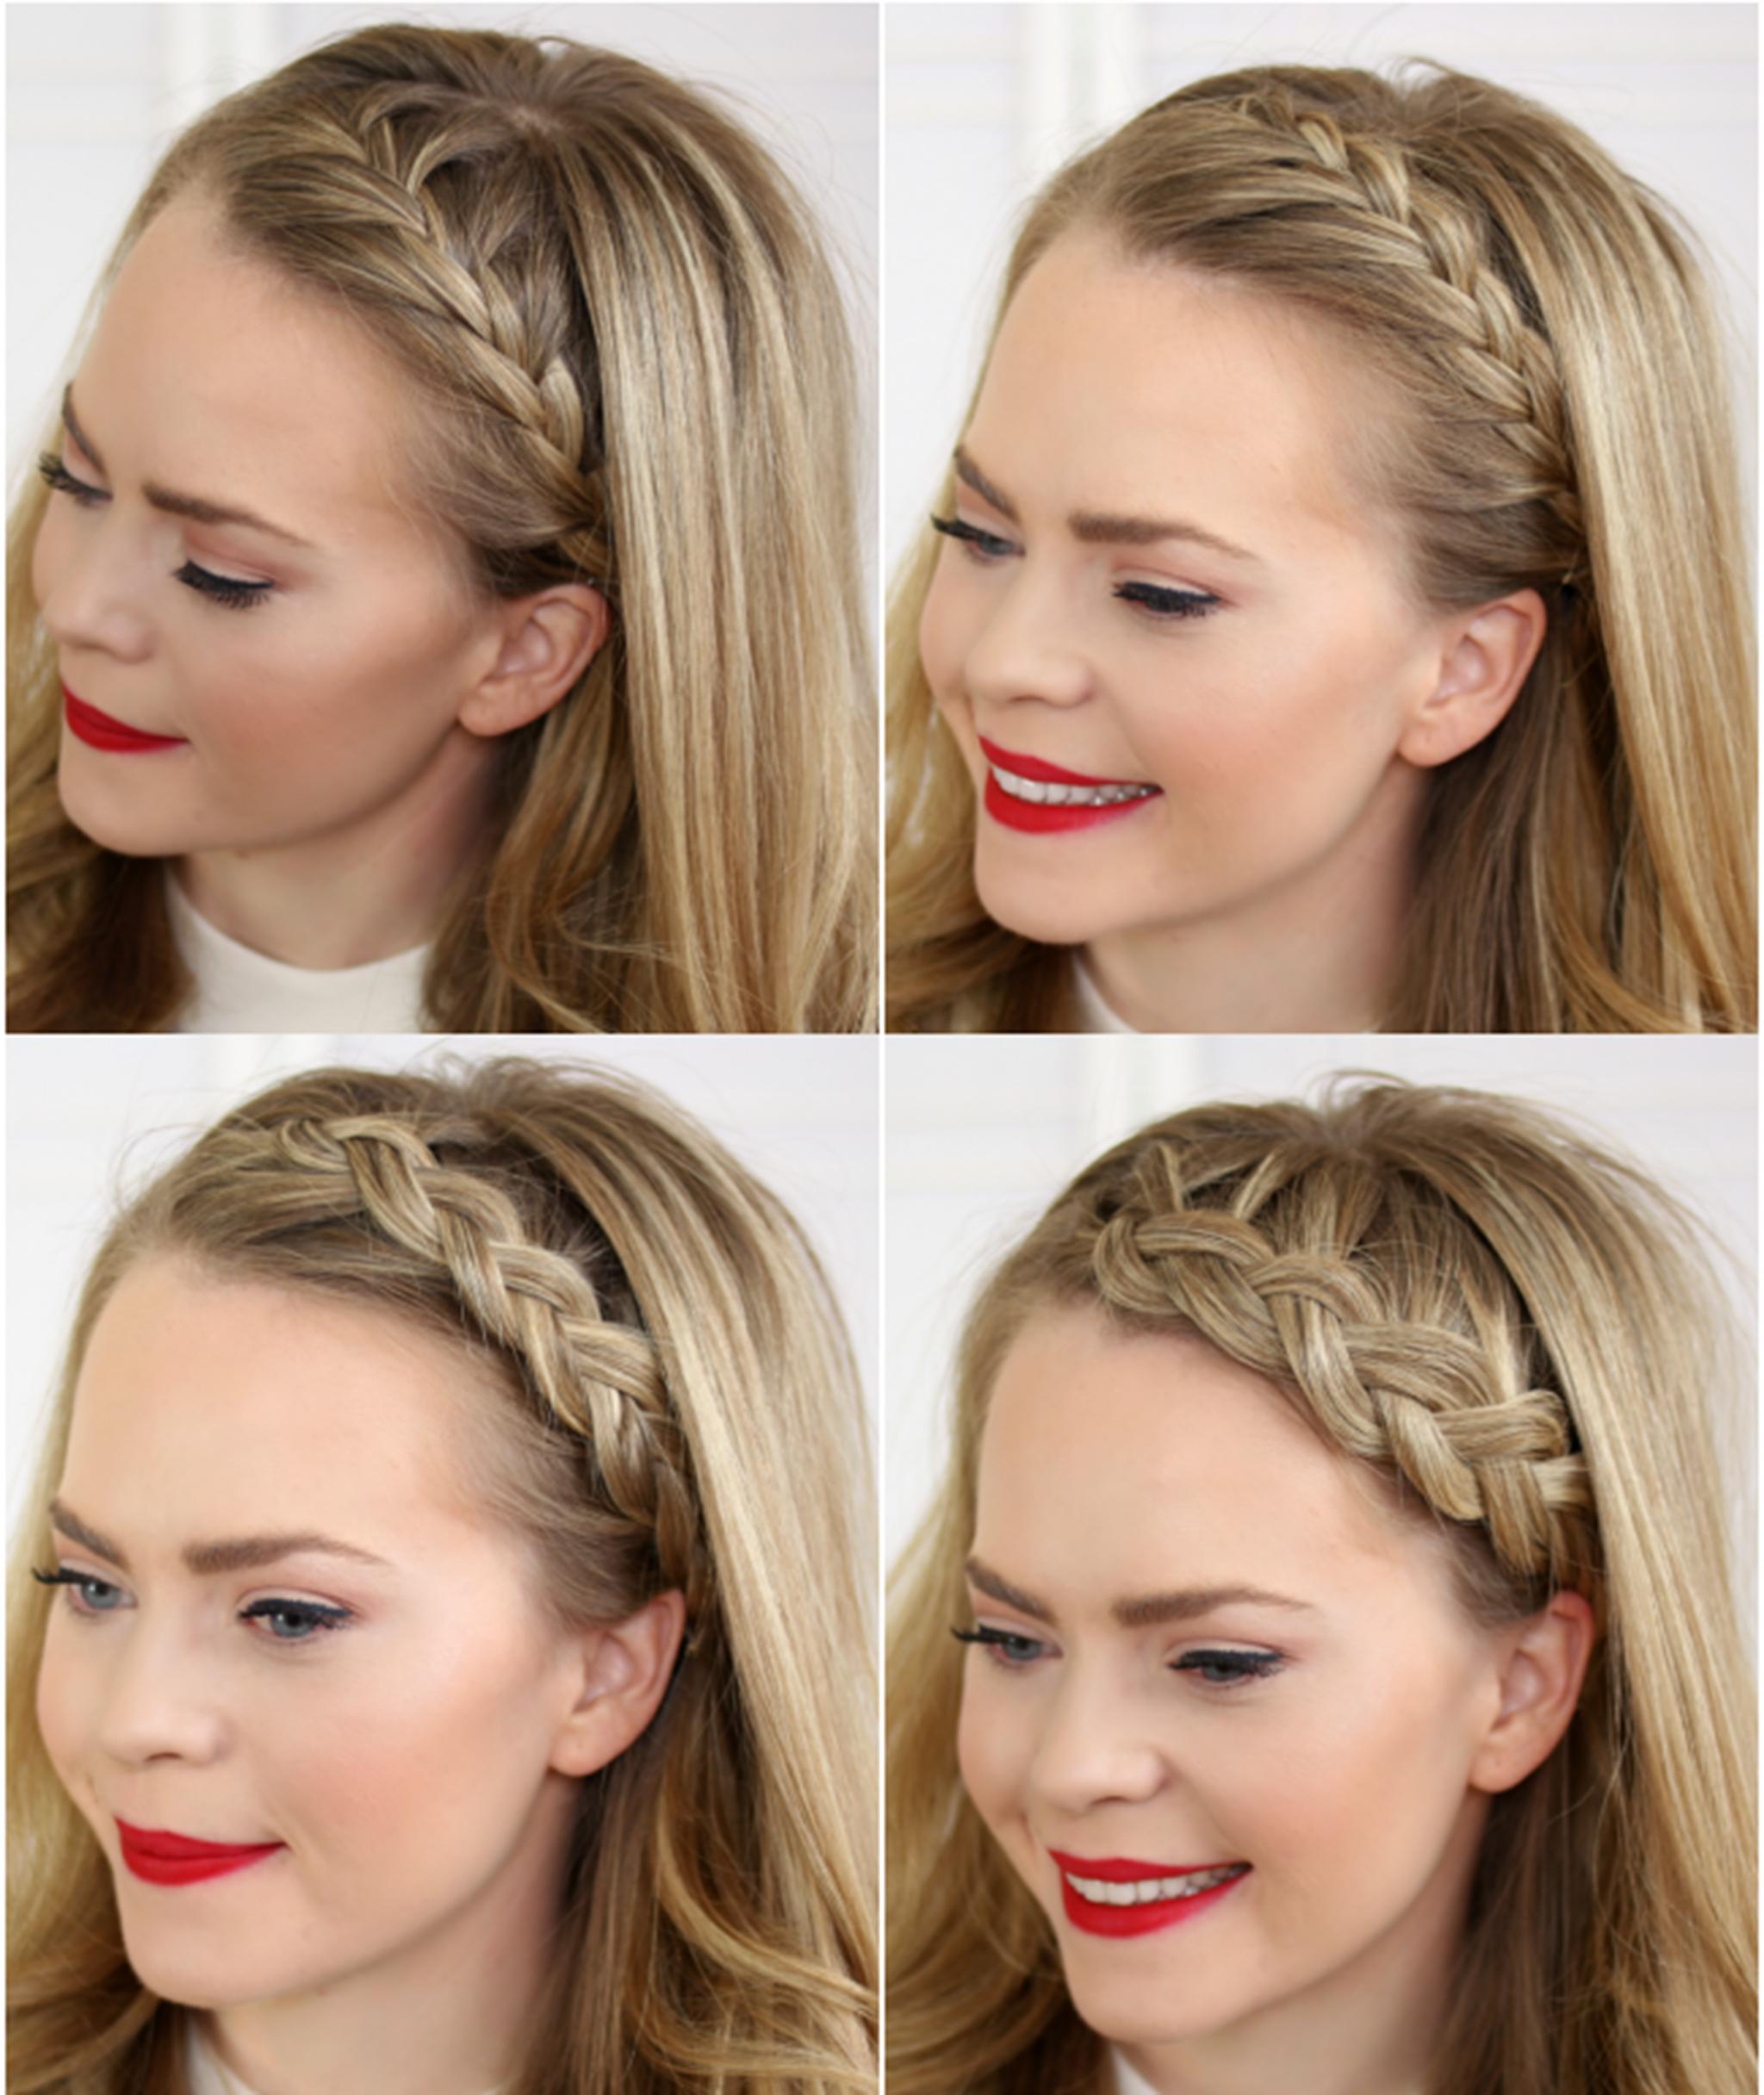 3. Headband Braid